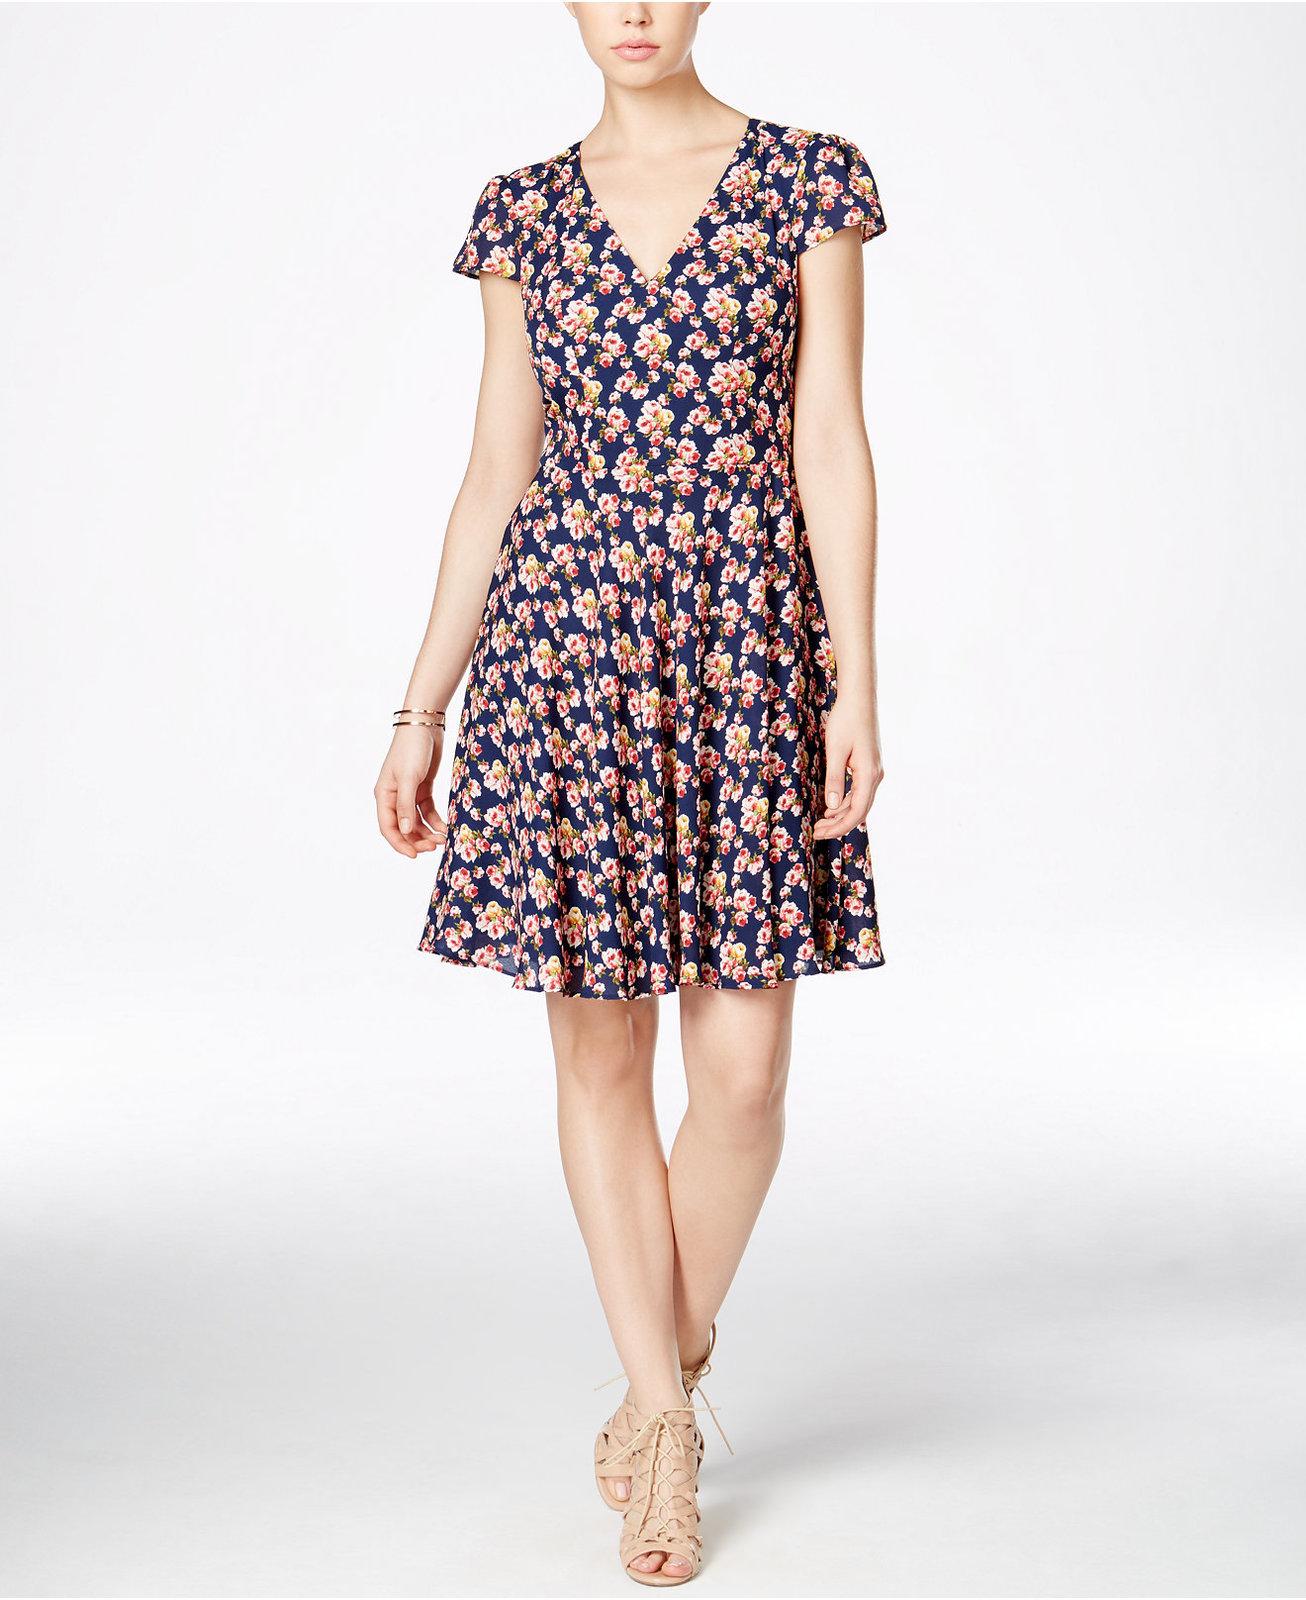 378080541e Betsey Johnson Floral-Print Cap-Sleeve Fit   Flare Dress